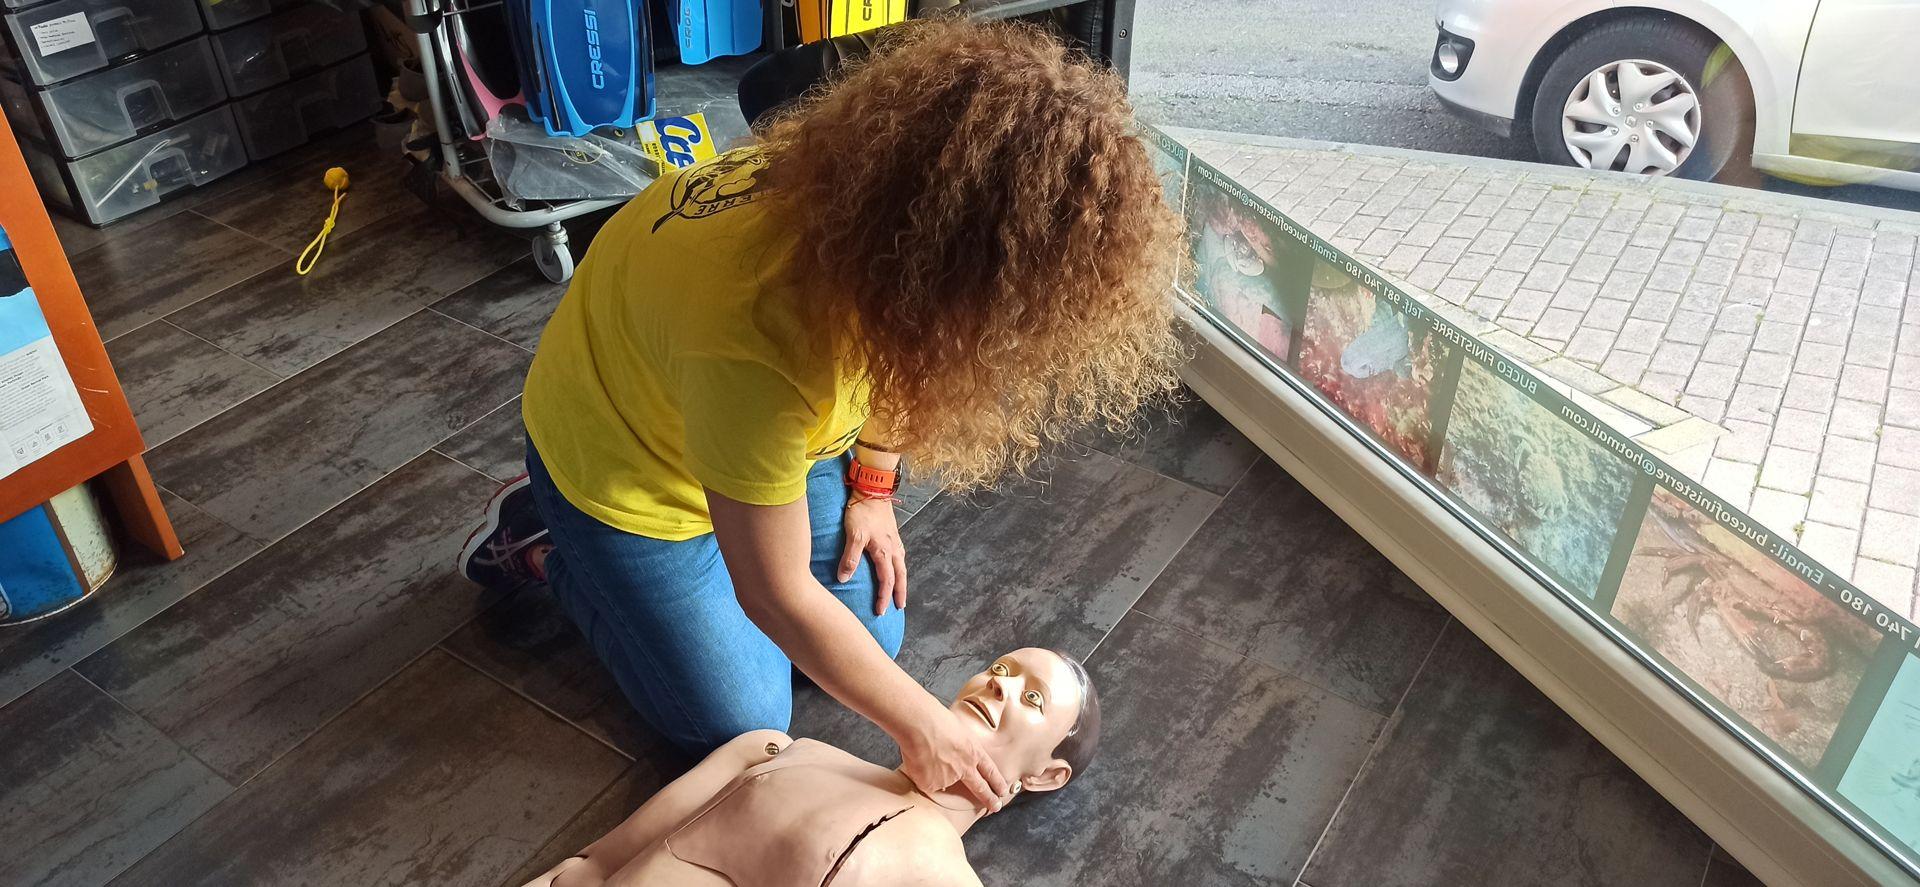 Primeros auxilios - Emergency First Response